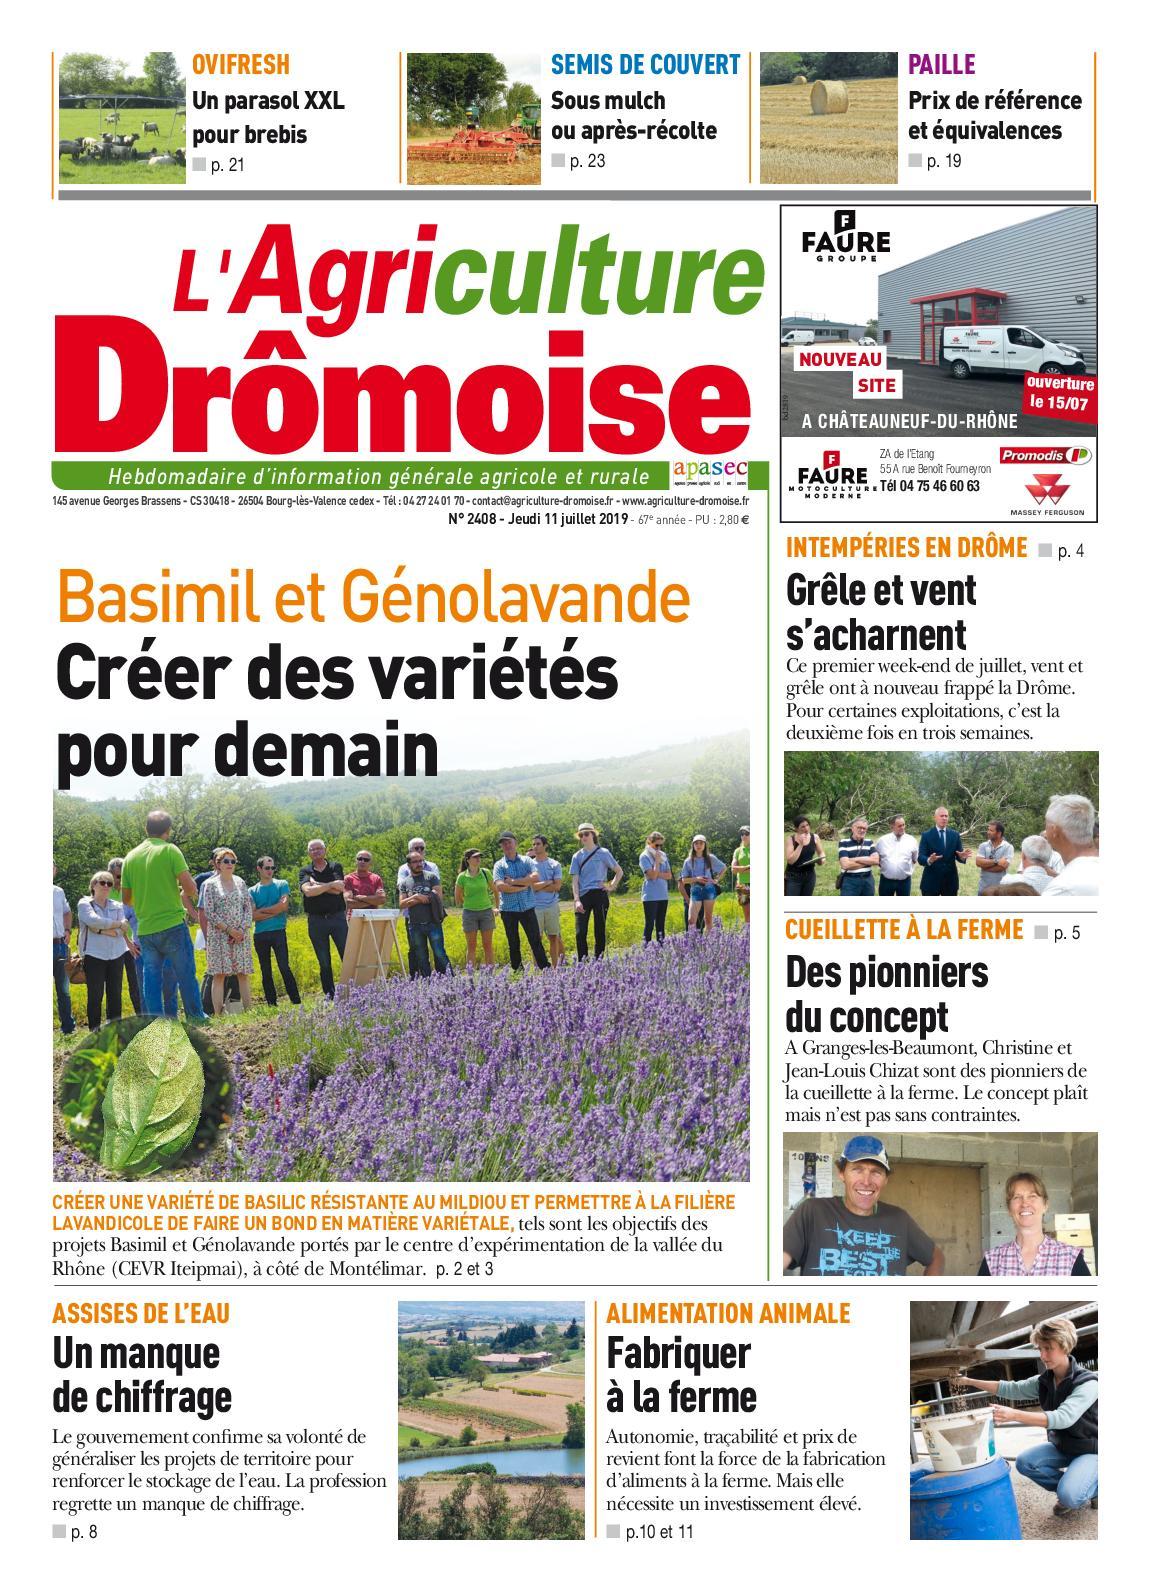 Sem28 Agriculture Dromoise 2408 L' Calaméo nkwP80O